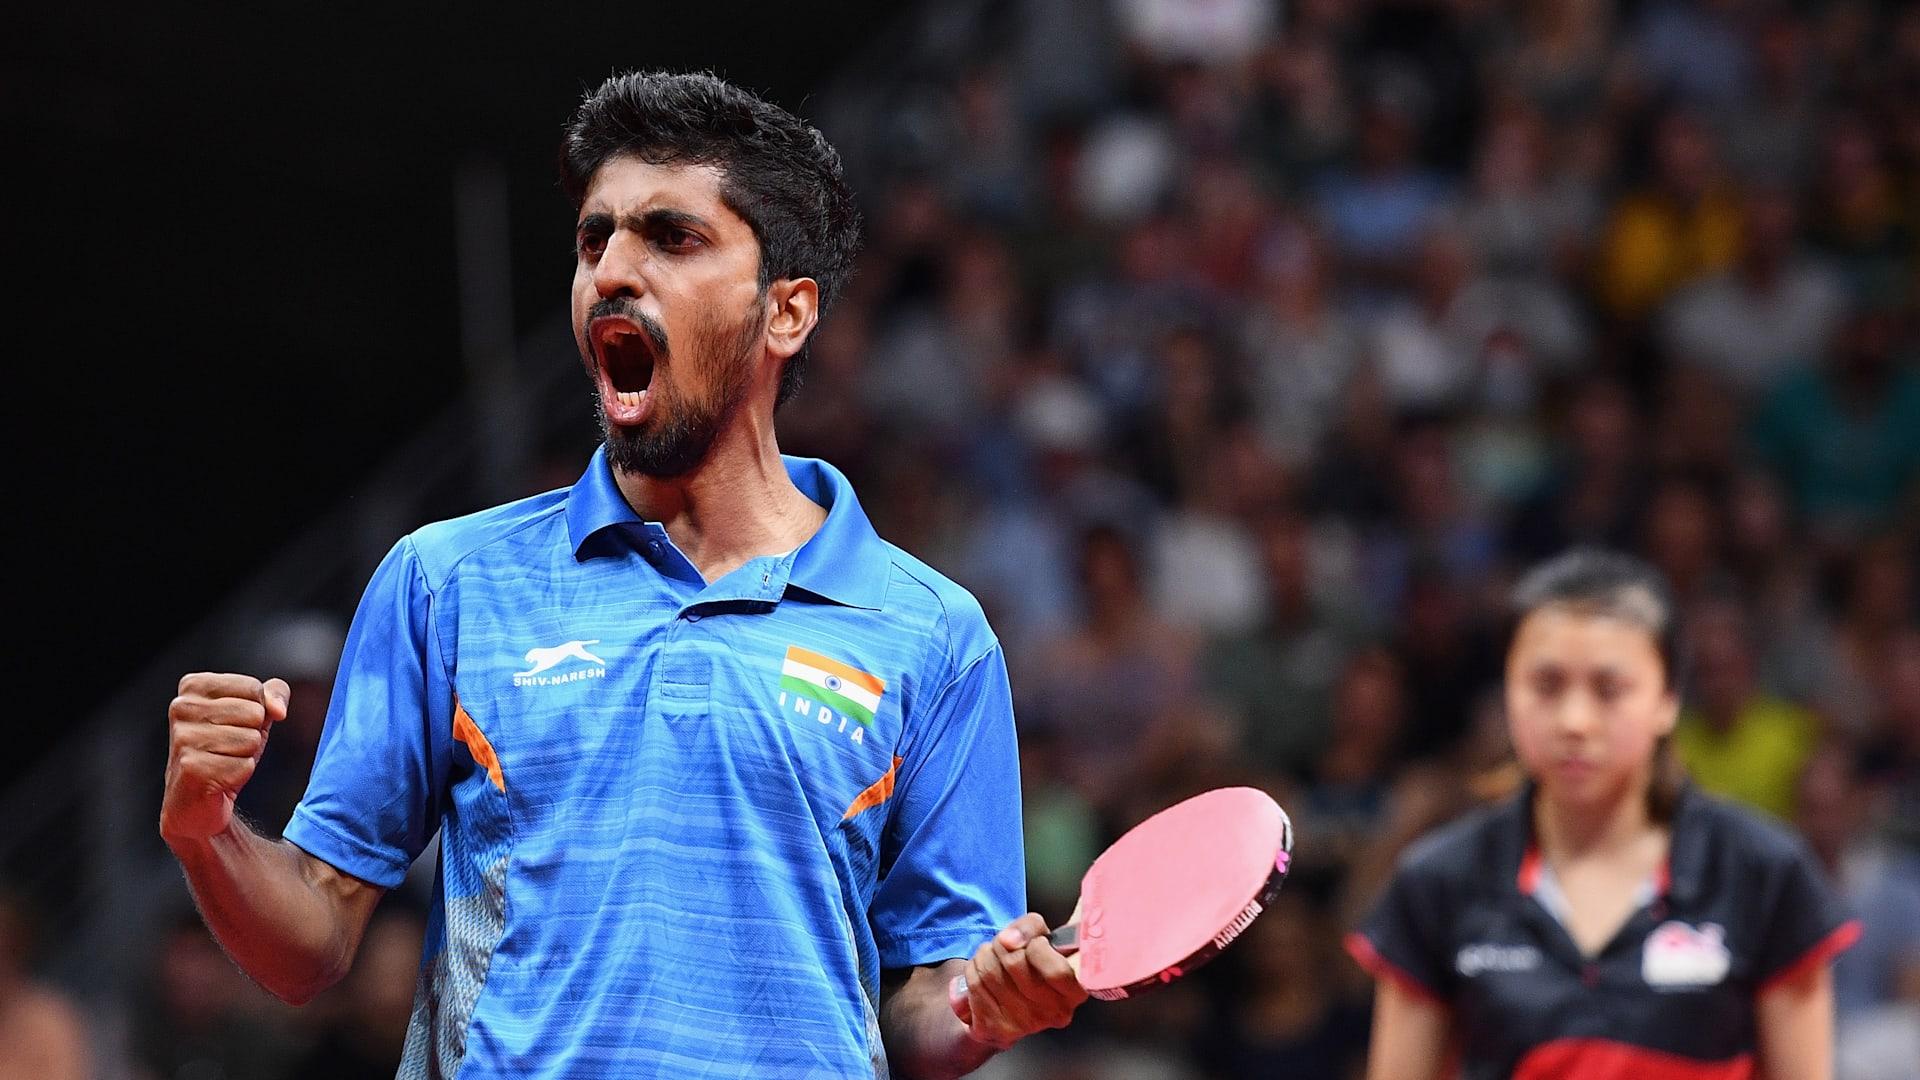 The story of Sathiyan Gnanasekaran: Engineer-turned-table tennis pro